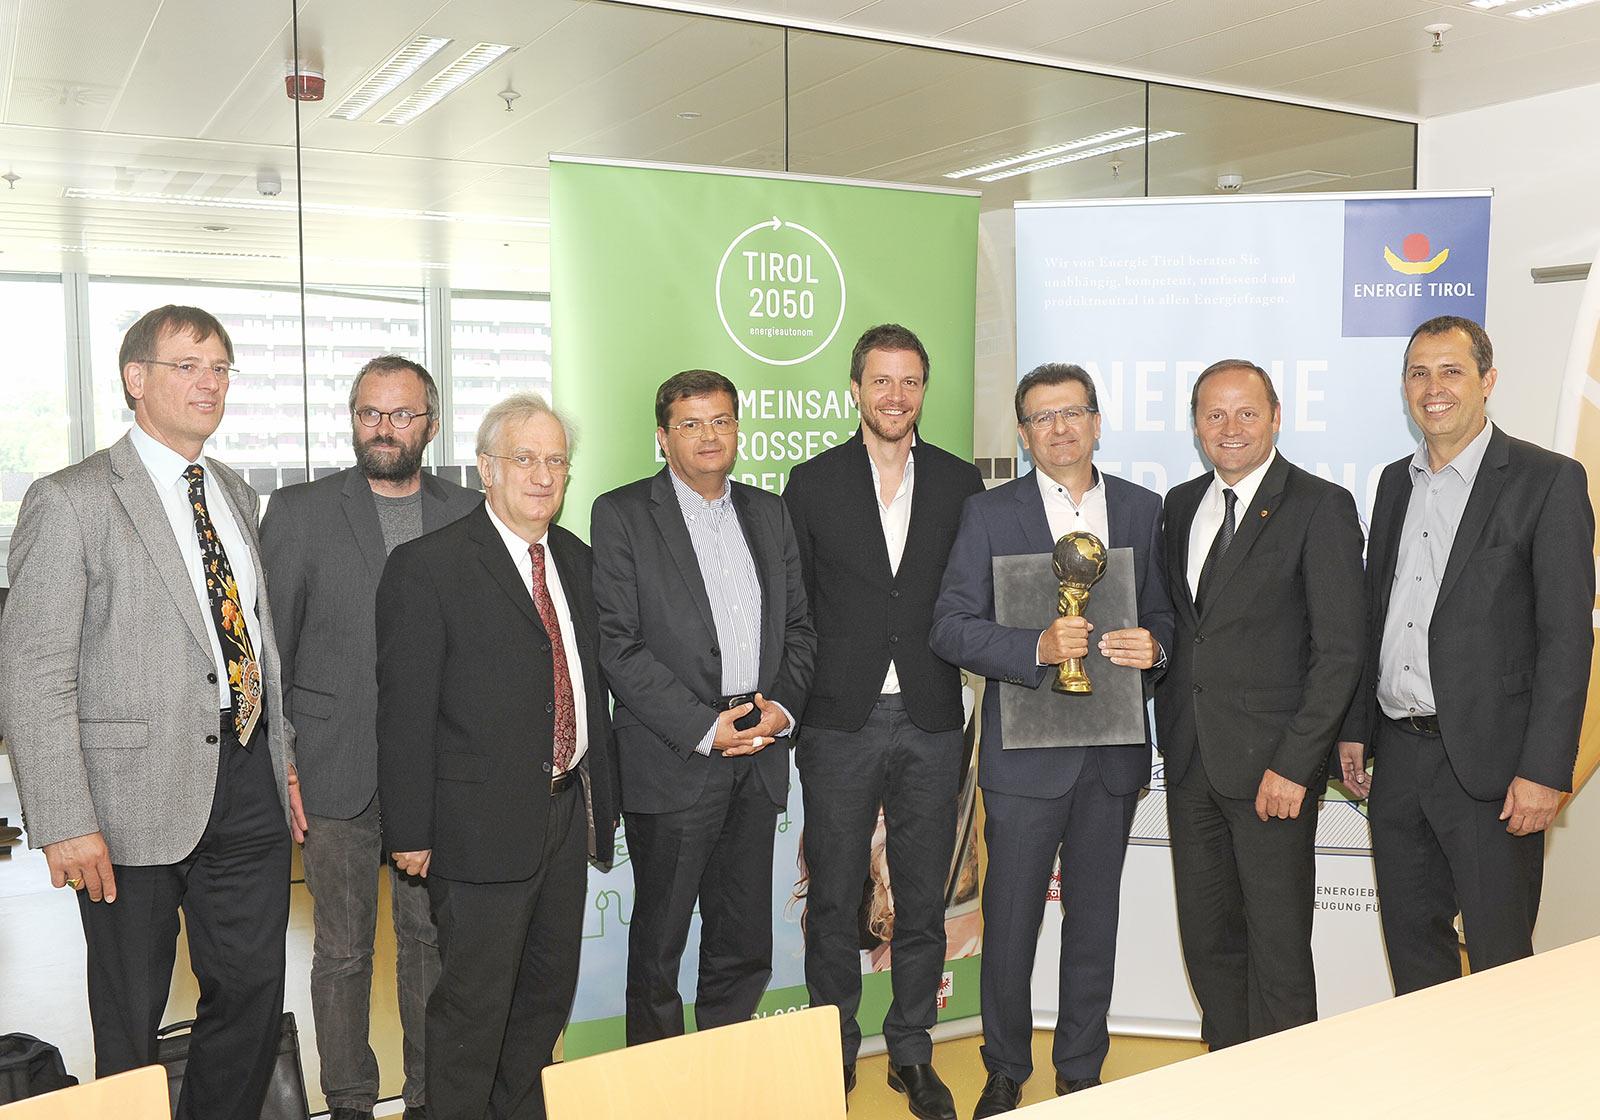 Paul Ohnmacht und Gerald Hulka nahmen den Energy Globe Award Tirol entgegen. Foto: Energie Tirol/Michael Gasser